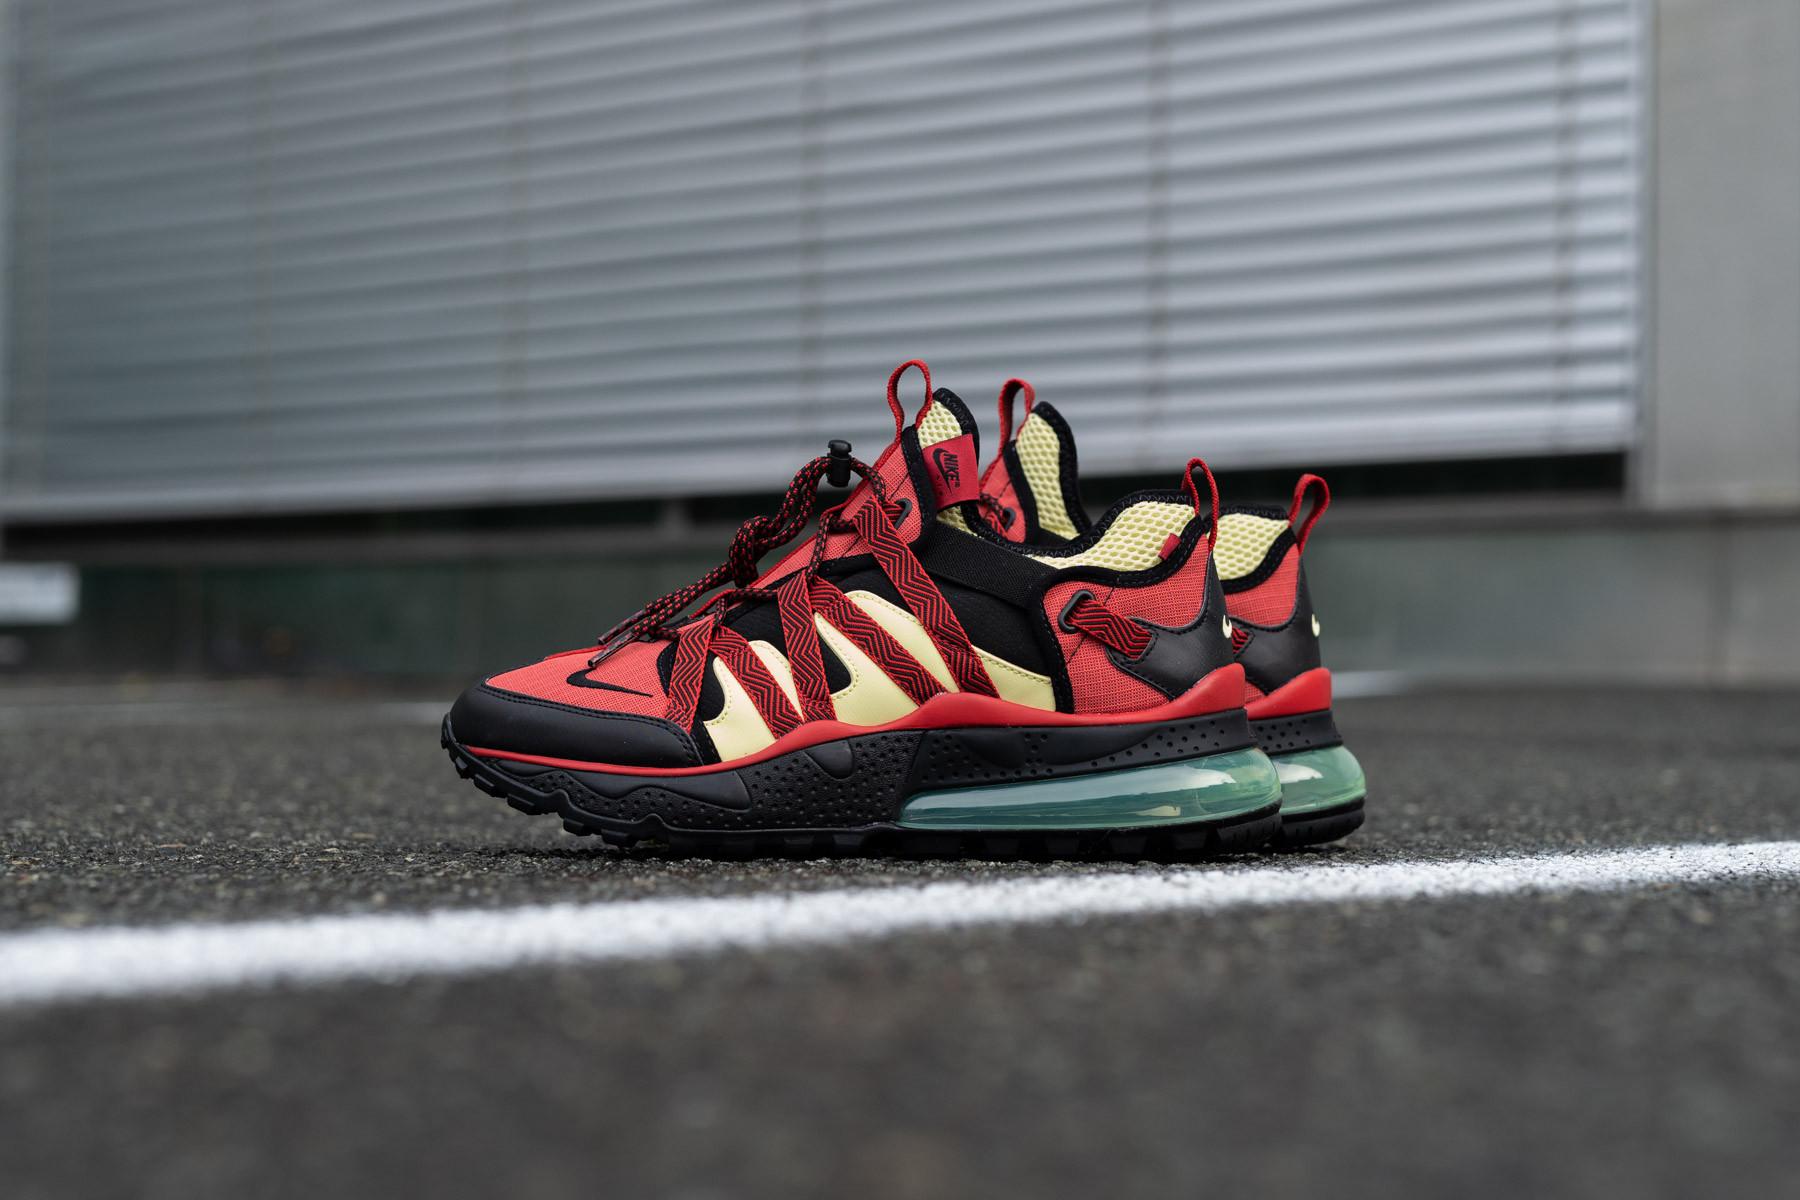 sale retailer f7695 cd405 Nike Air Max 270 Bowfin - Sneakers   SNEAKER.NO - efi-ife.org